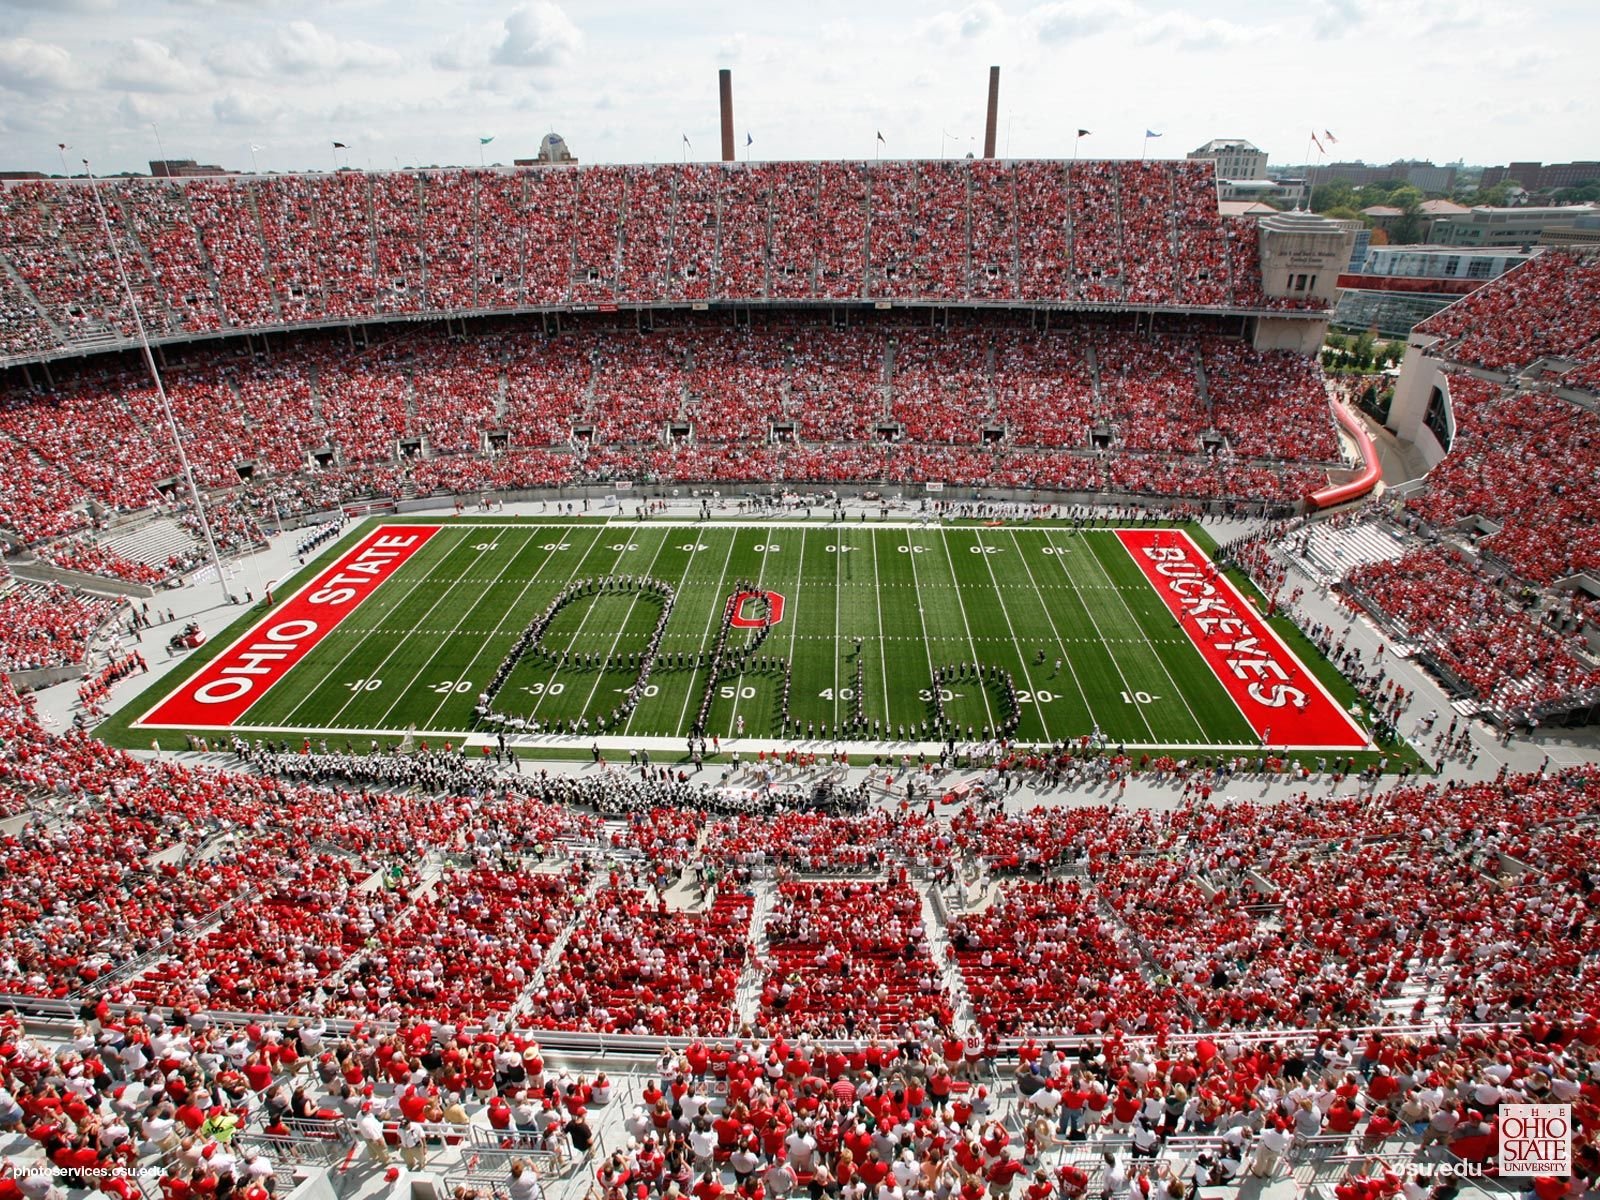 Google Image Result For Http Www Osu Edu Download Web Images Bigpics 23 Jpg Ohio State Buckeyes Football Ohio State Football Ohio State